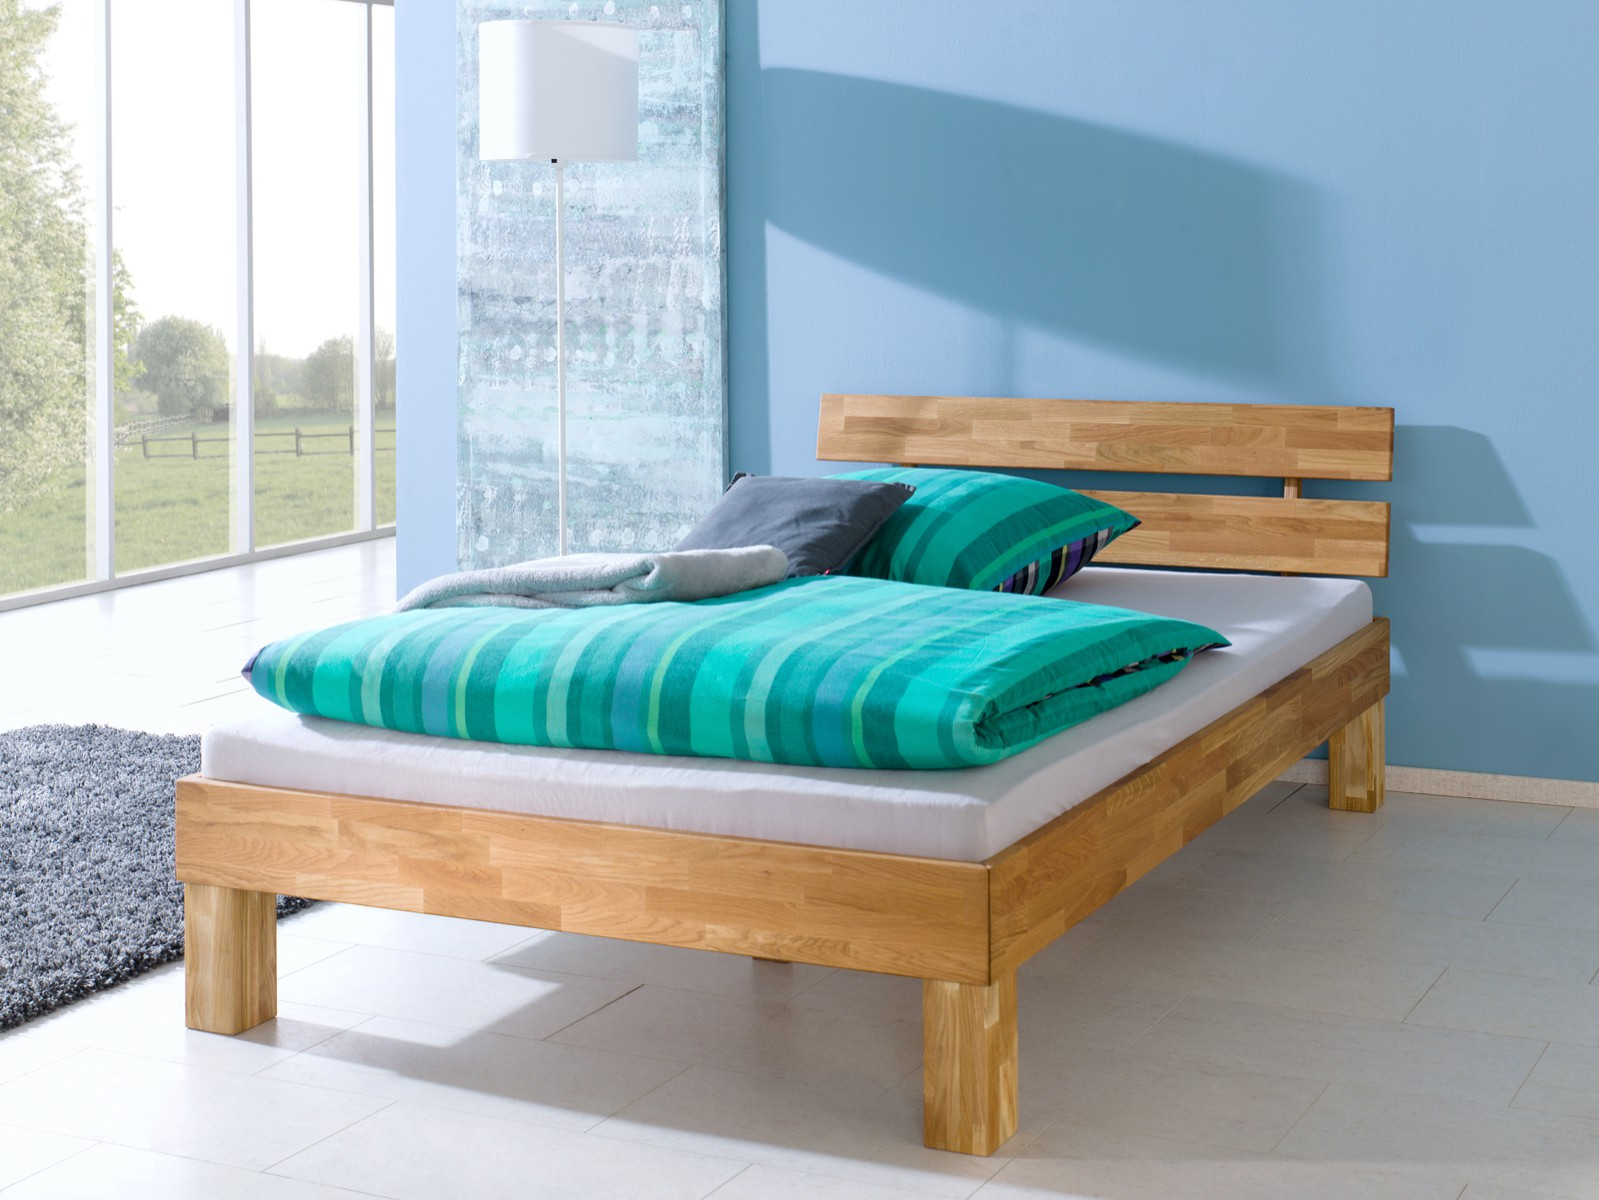 massivholzbett buche futon einzelbett 90x200 bettgestell sehr stabil or ebay. Black Bedroom Furniture Sets. Home Design Ideas